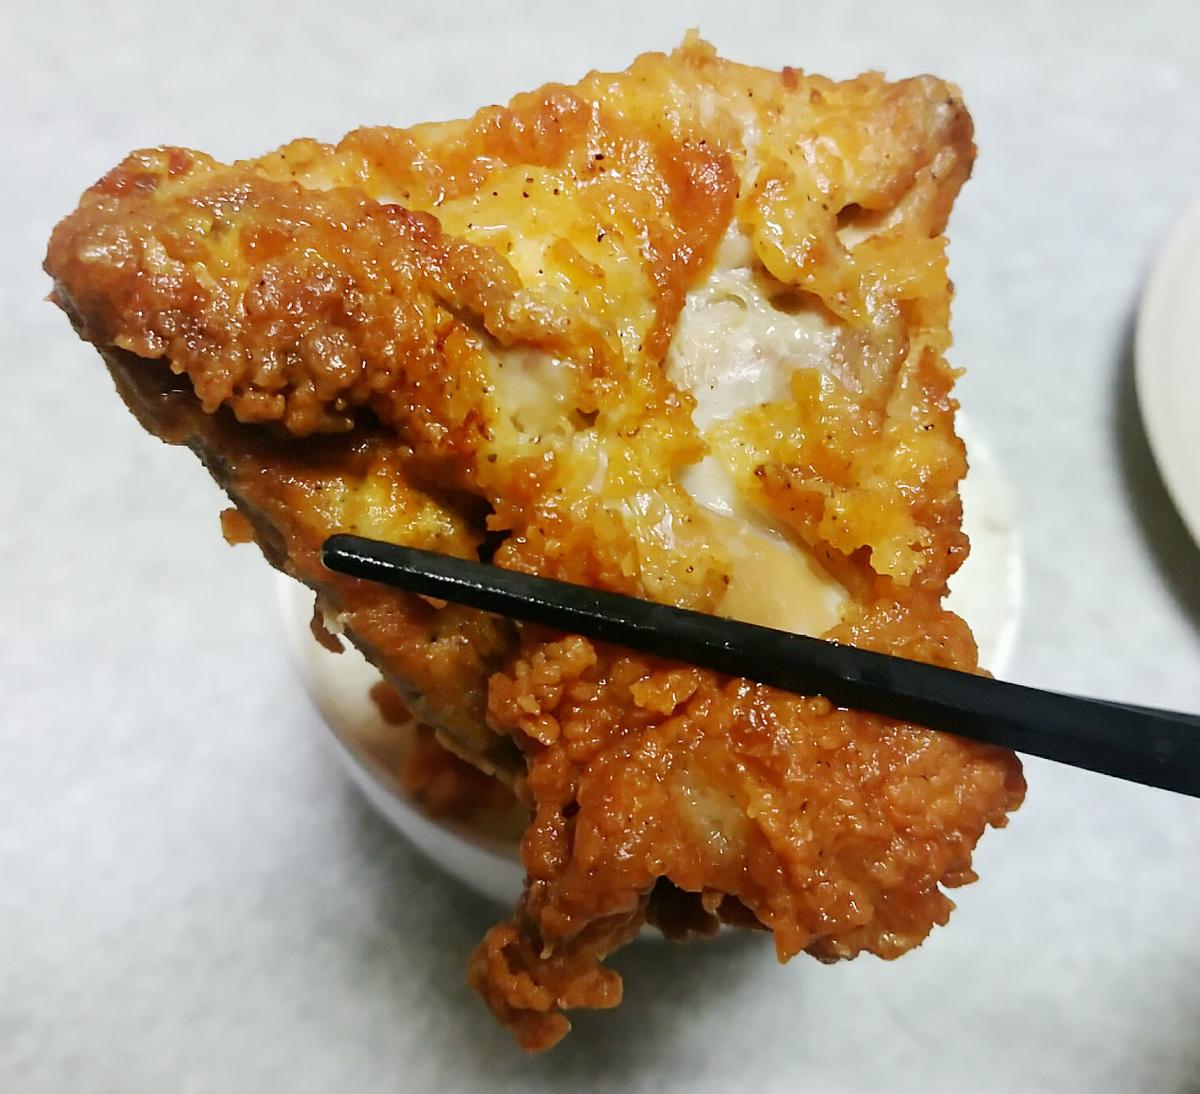 KFCフライドチキンの部位を説明します4